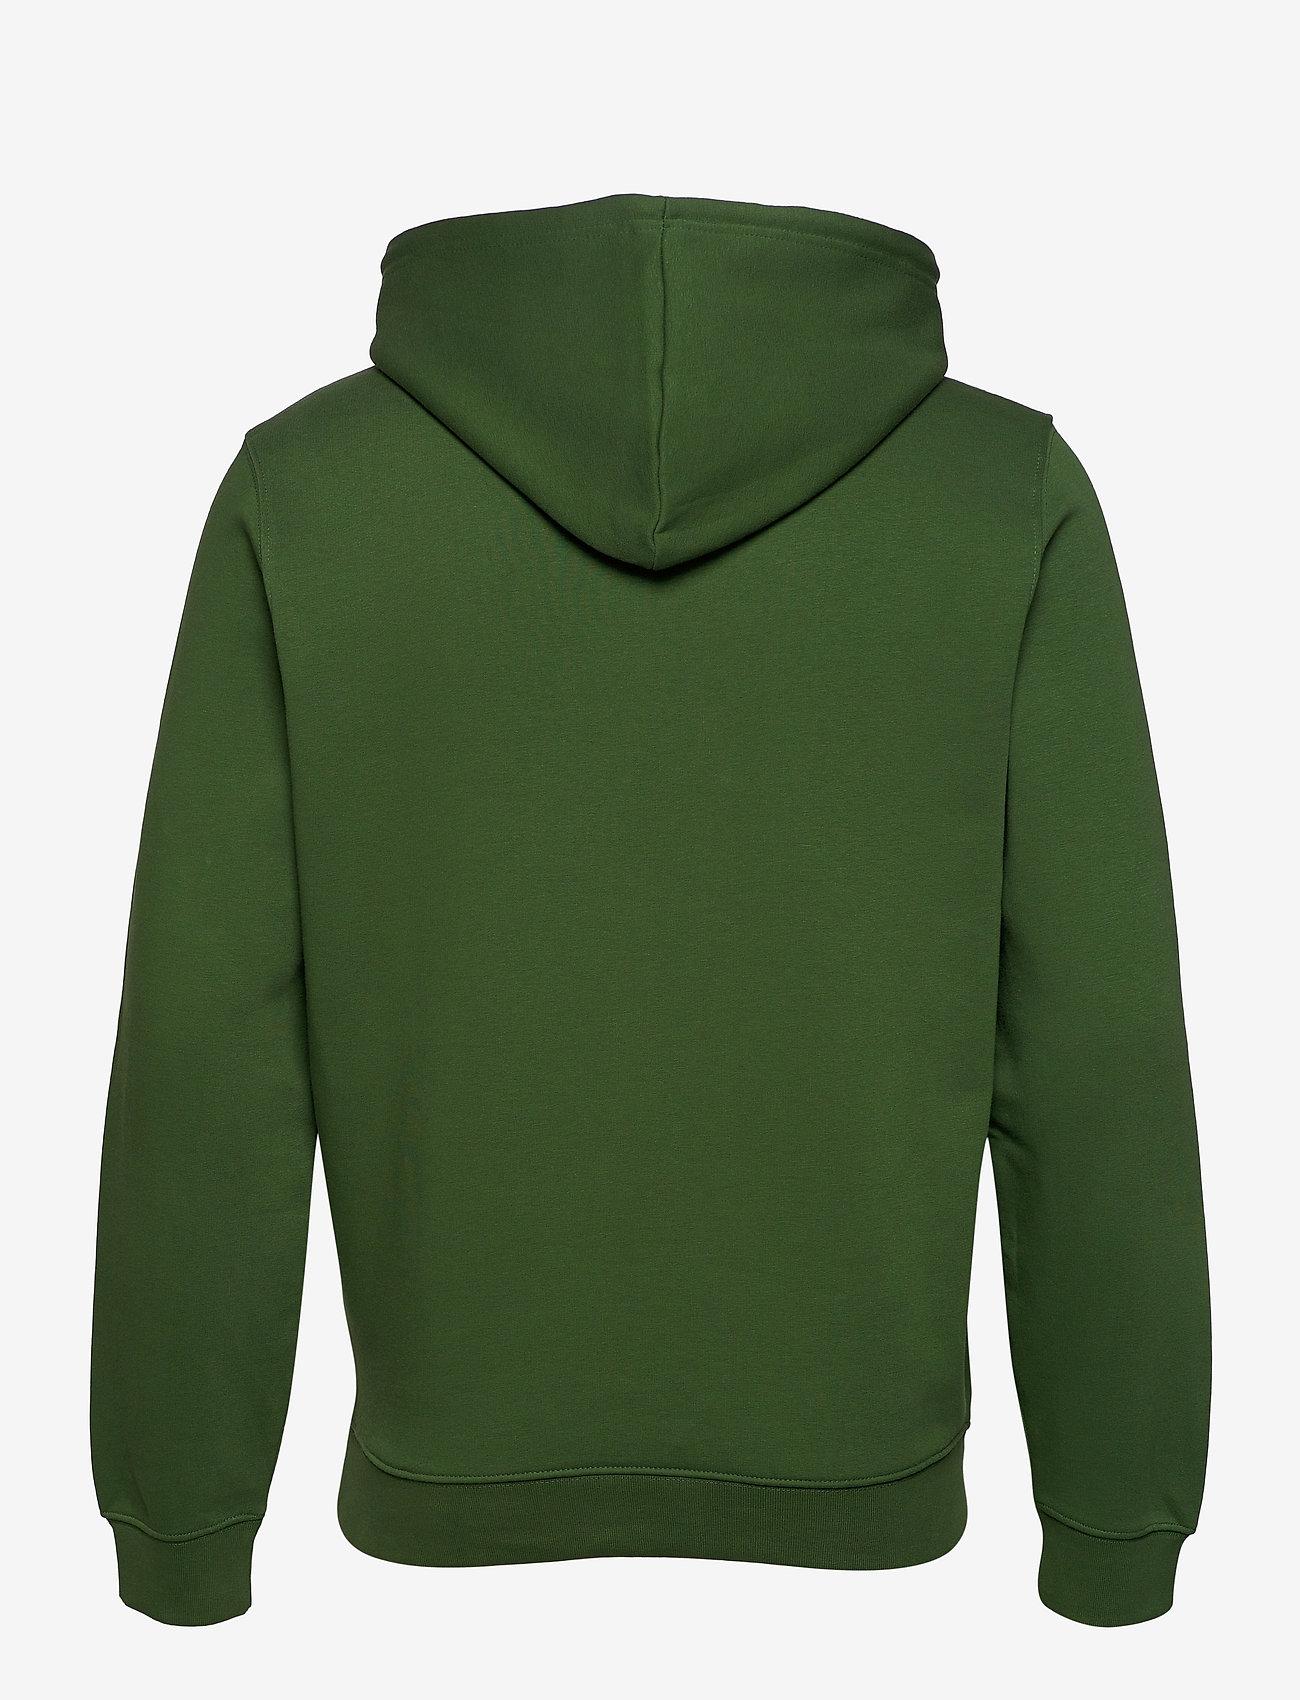 Champion Hooded Sweatshirt - Sweatshirts GREENER PASTURES - Menn Klær